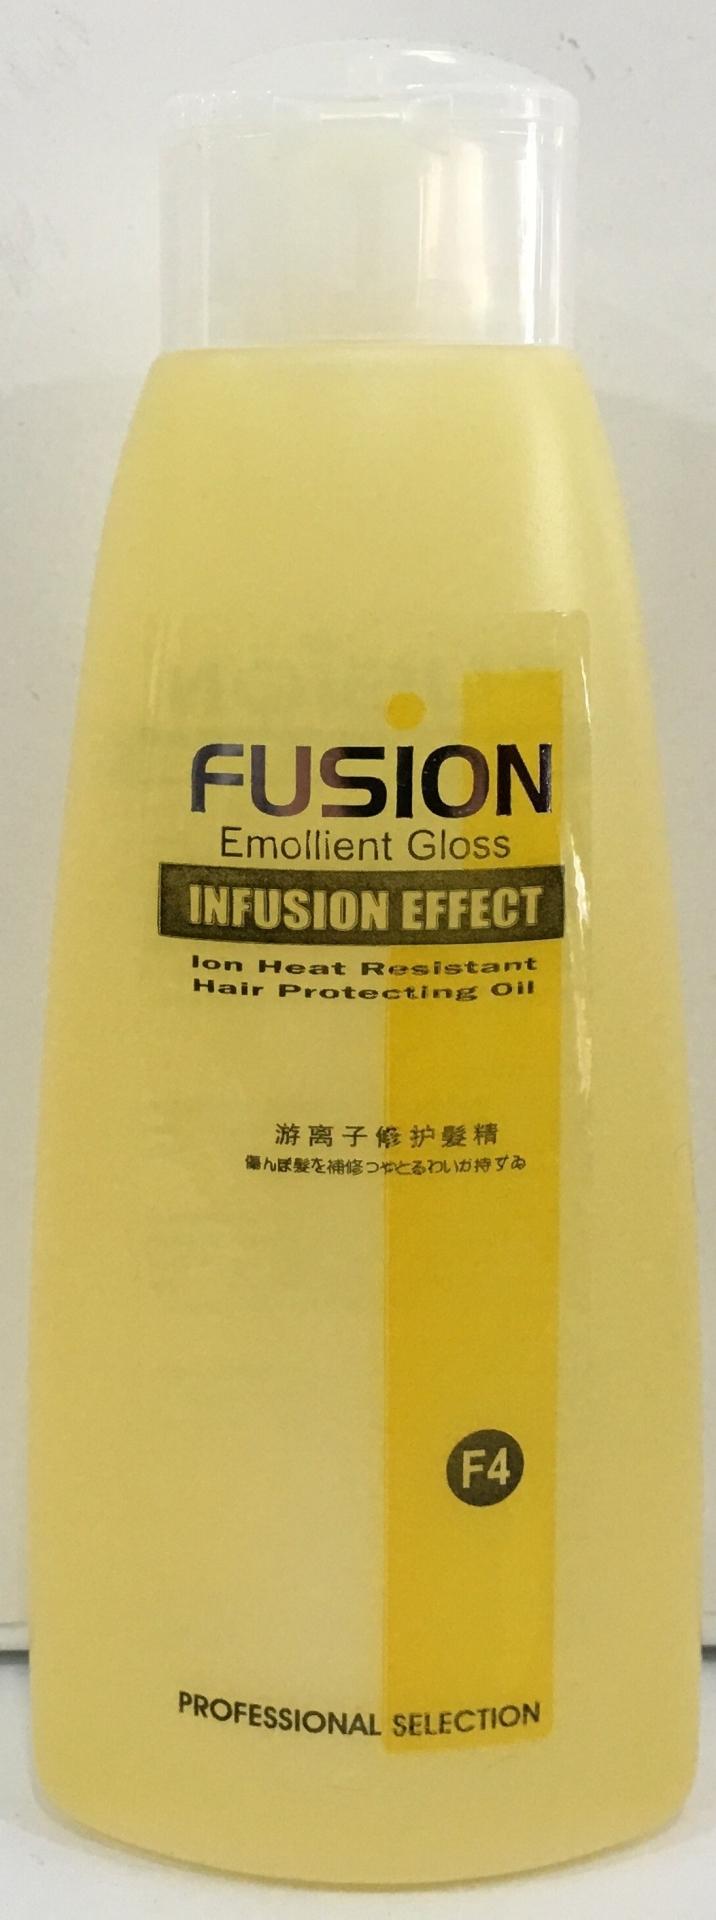 FUSION EMOLLIENT GLOSS F4 150ML